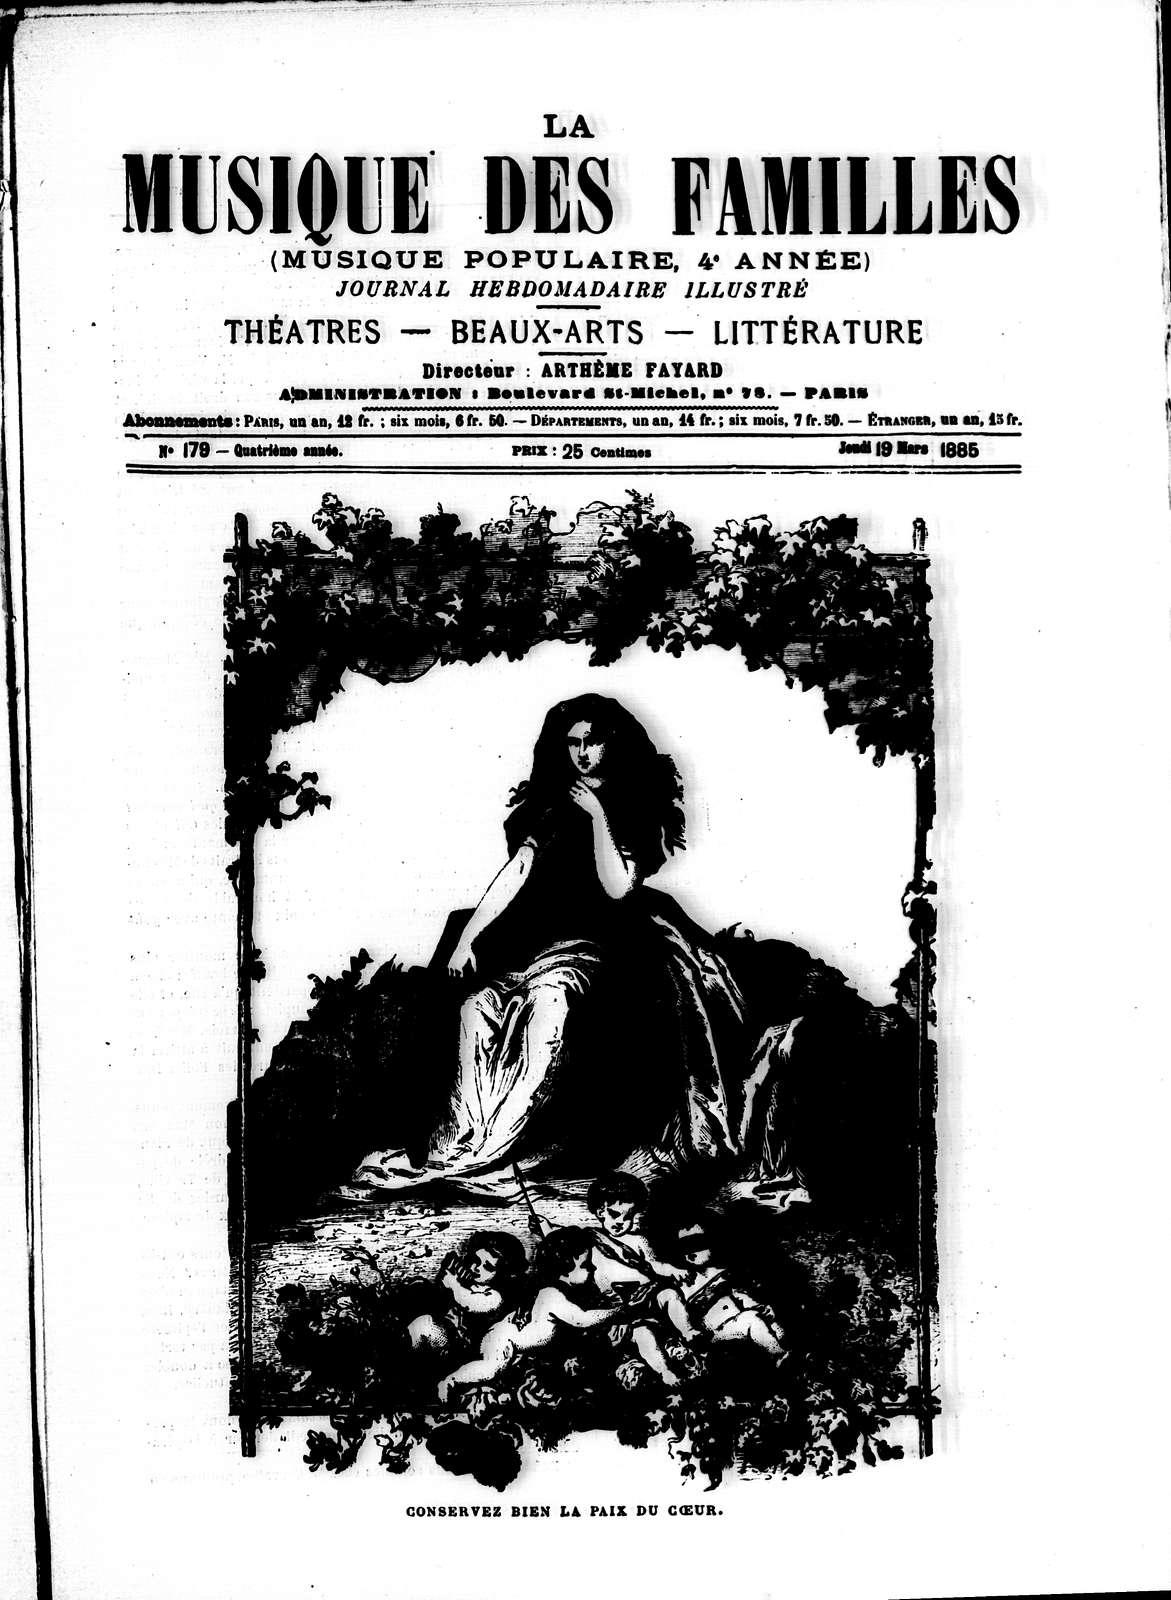 La Musique populaire, Vol. 4, no. 179